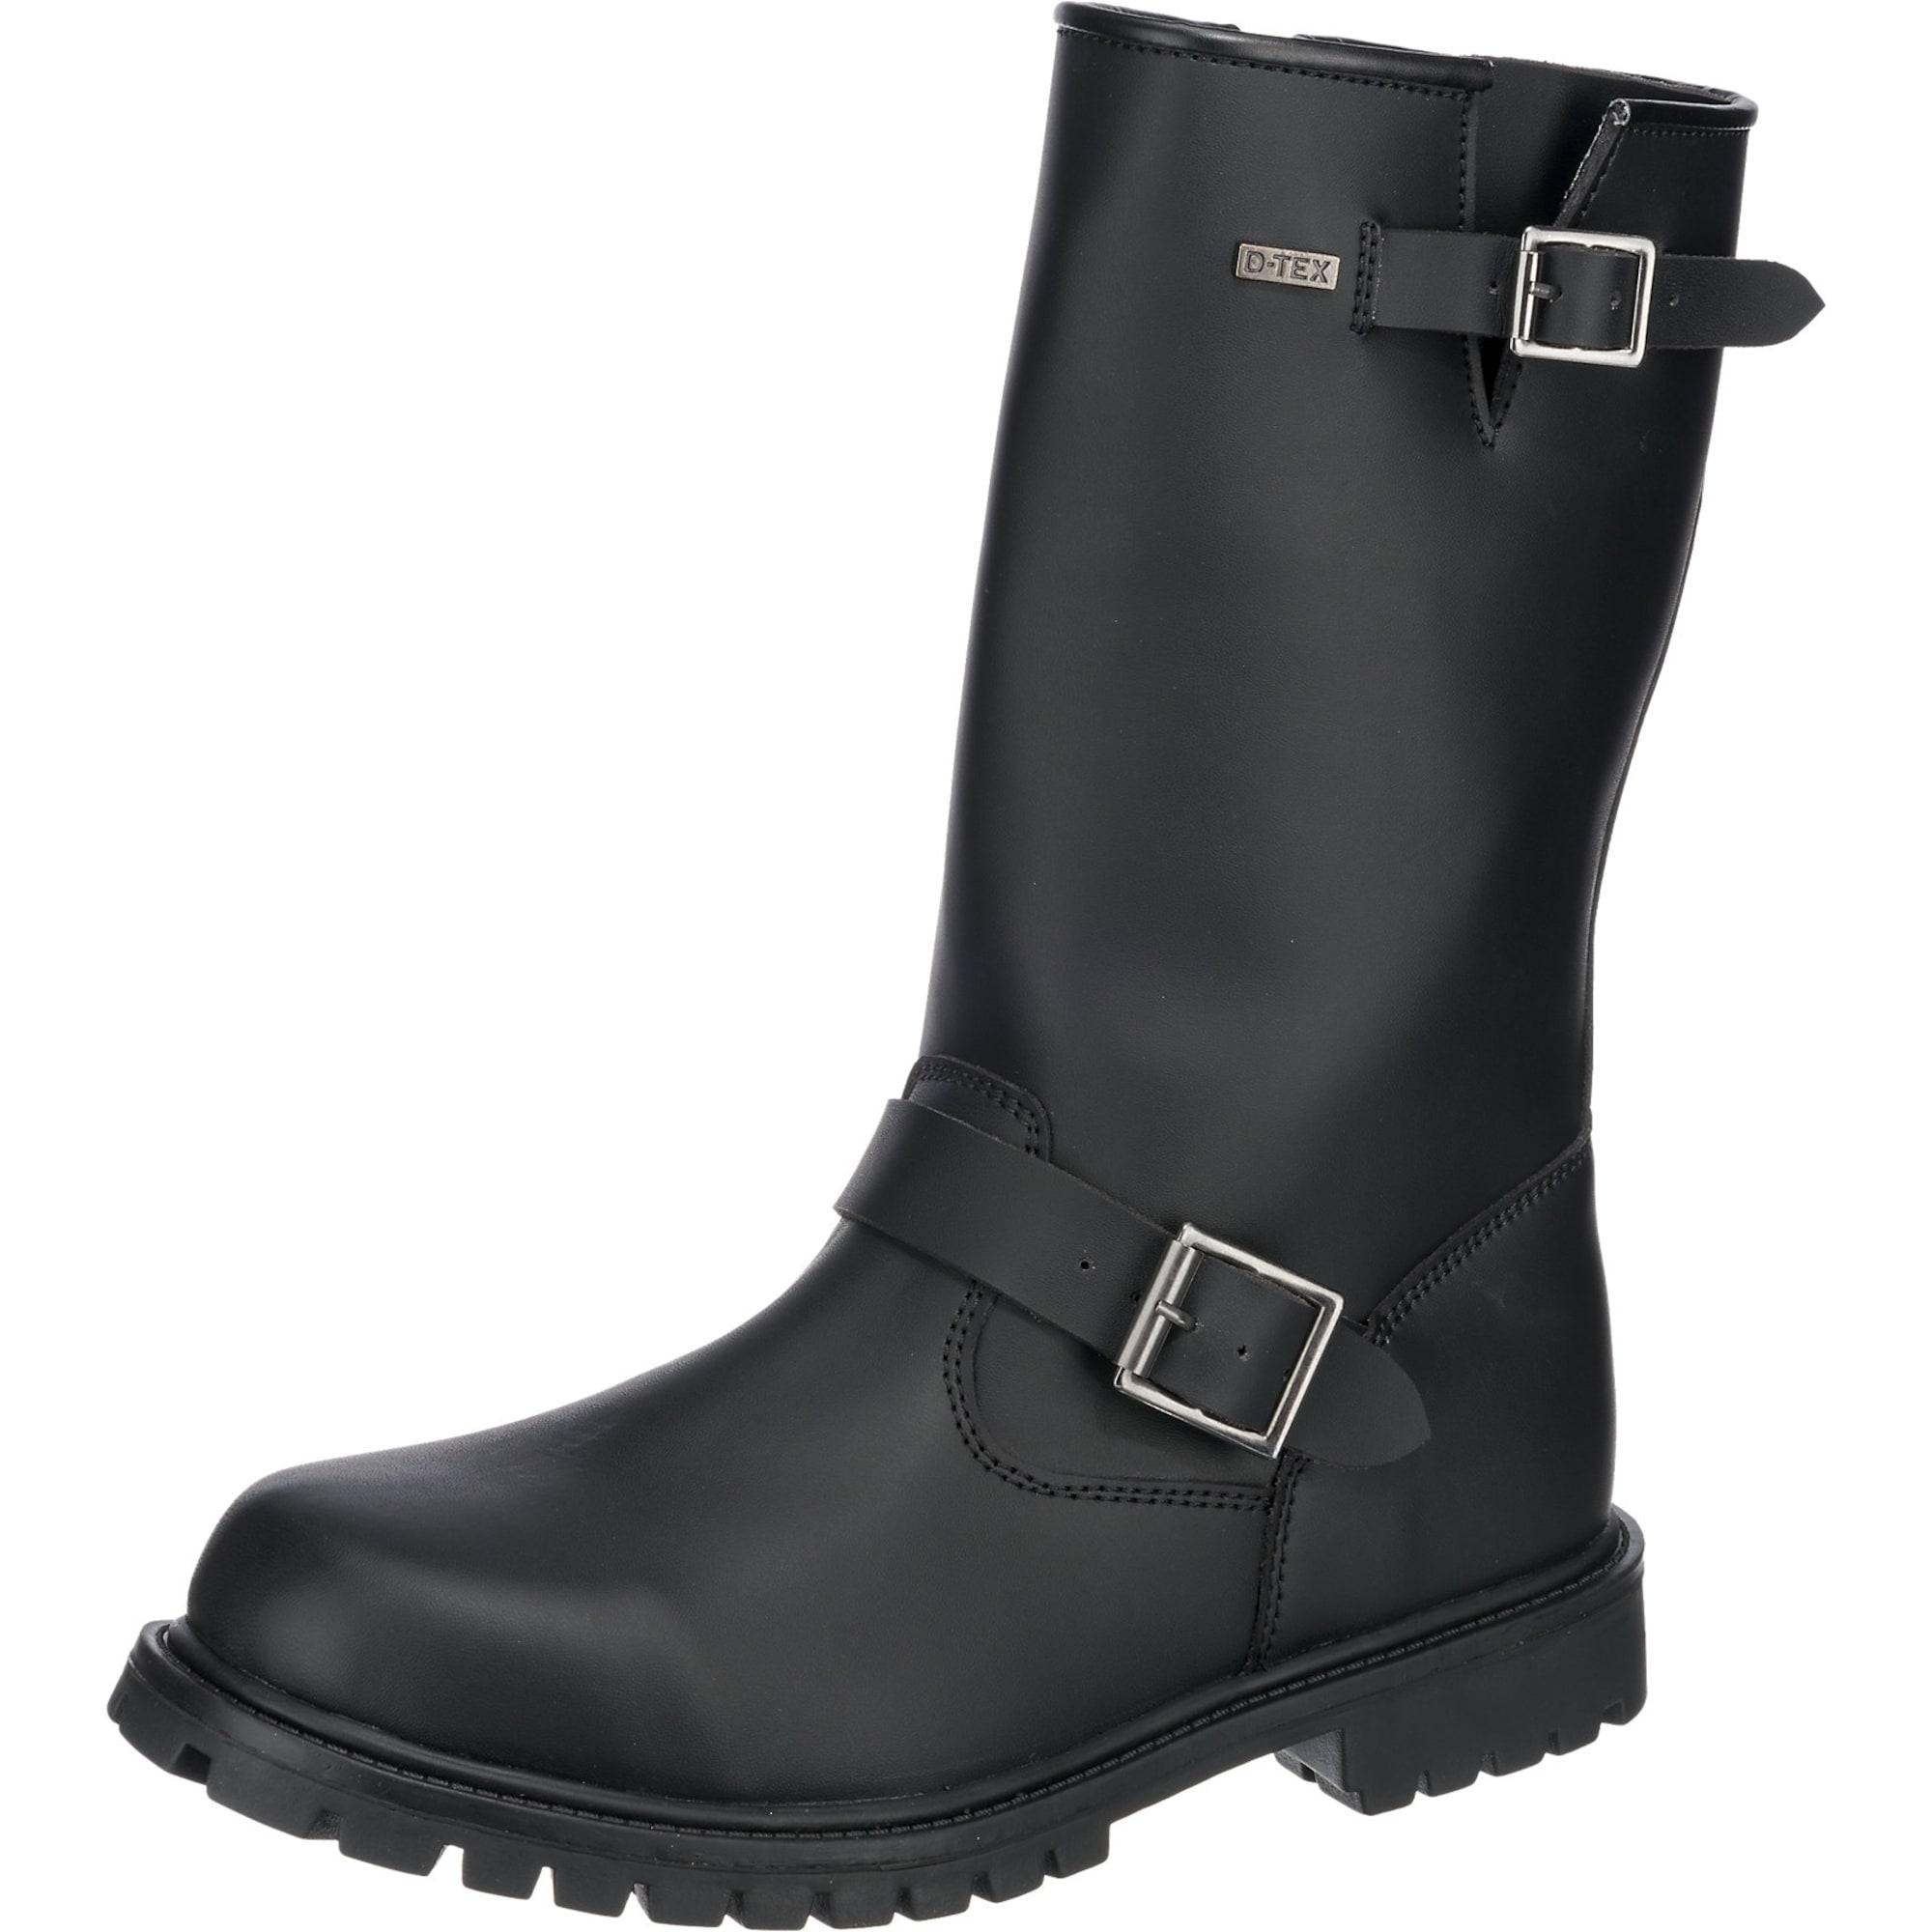 Bikerboots 'Outback'   Schuhe > Boots > Bikerboots   Kochmann